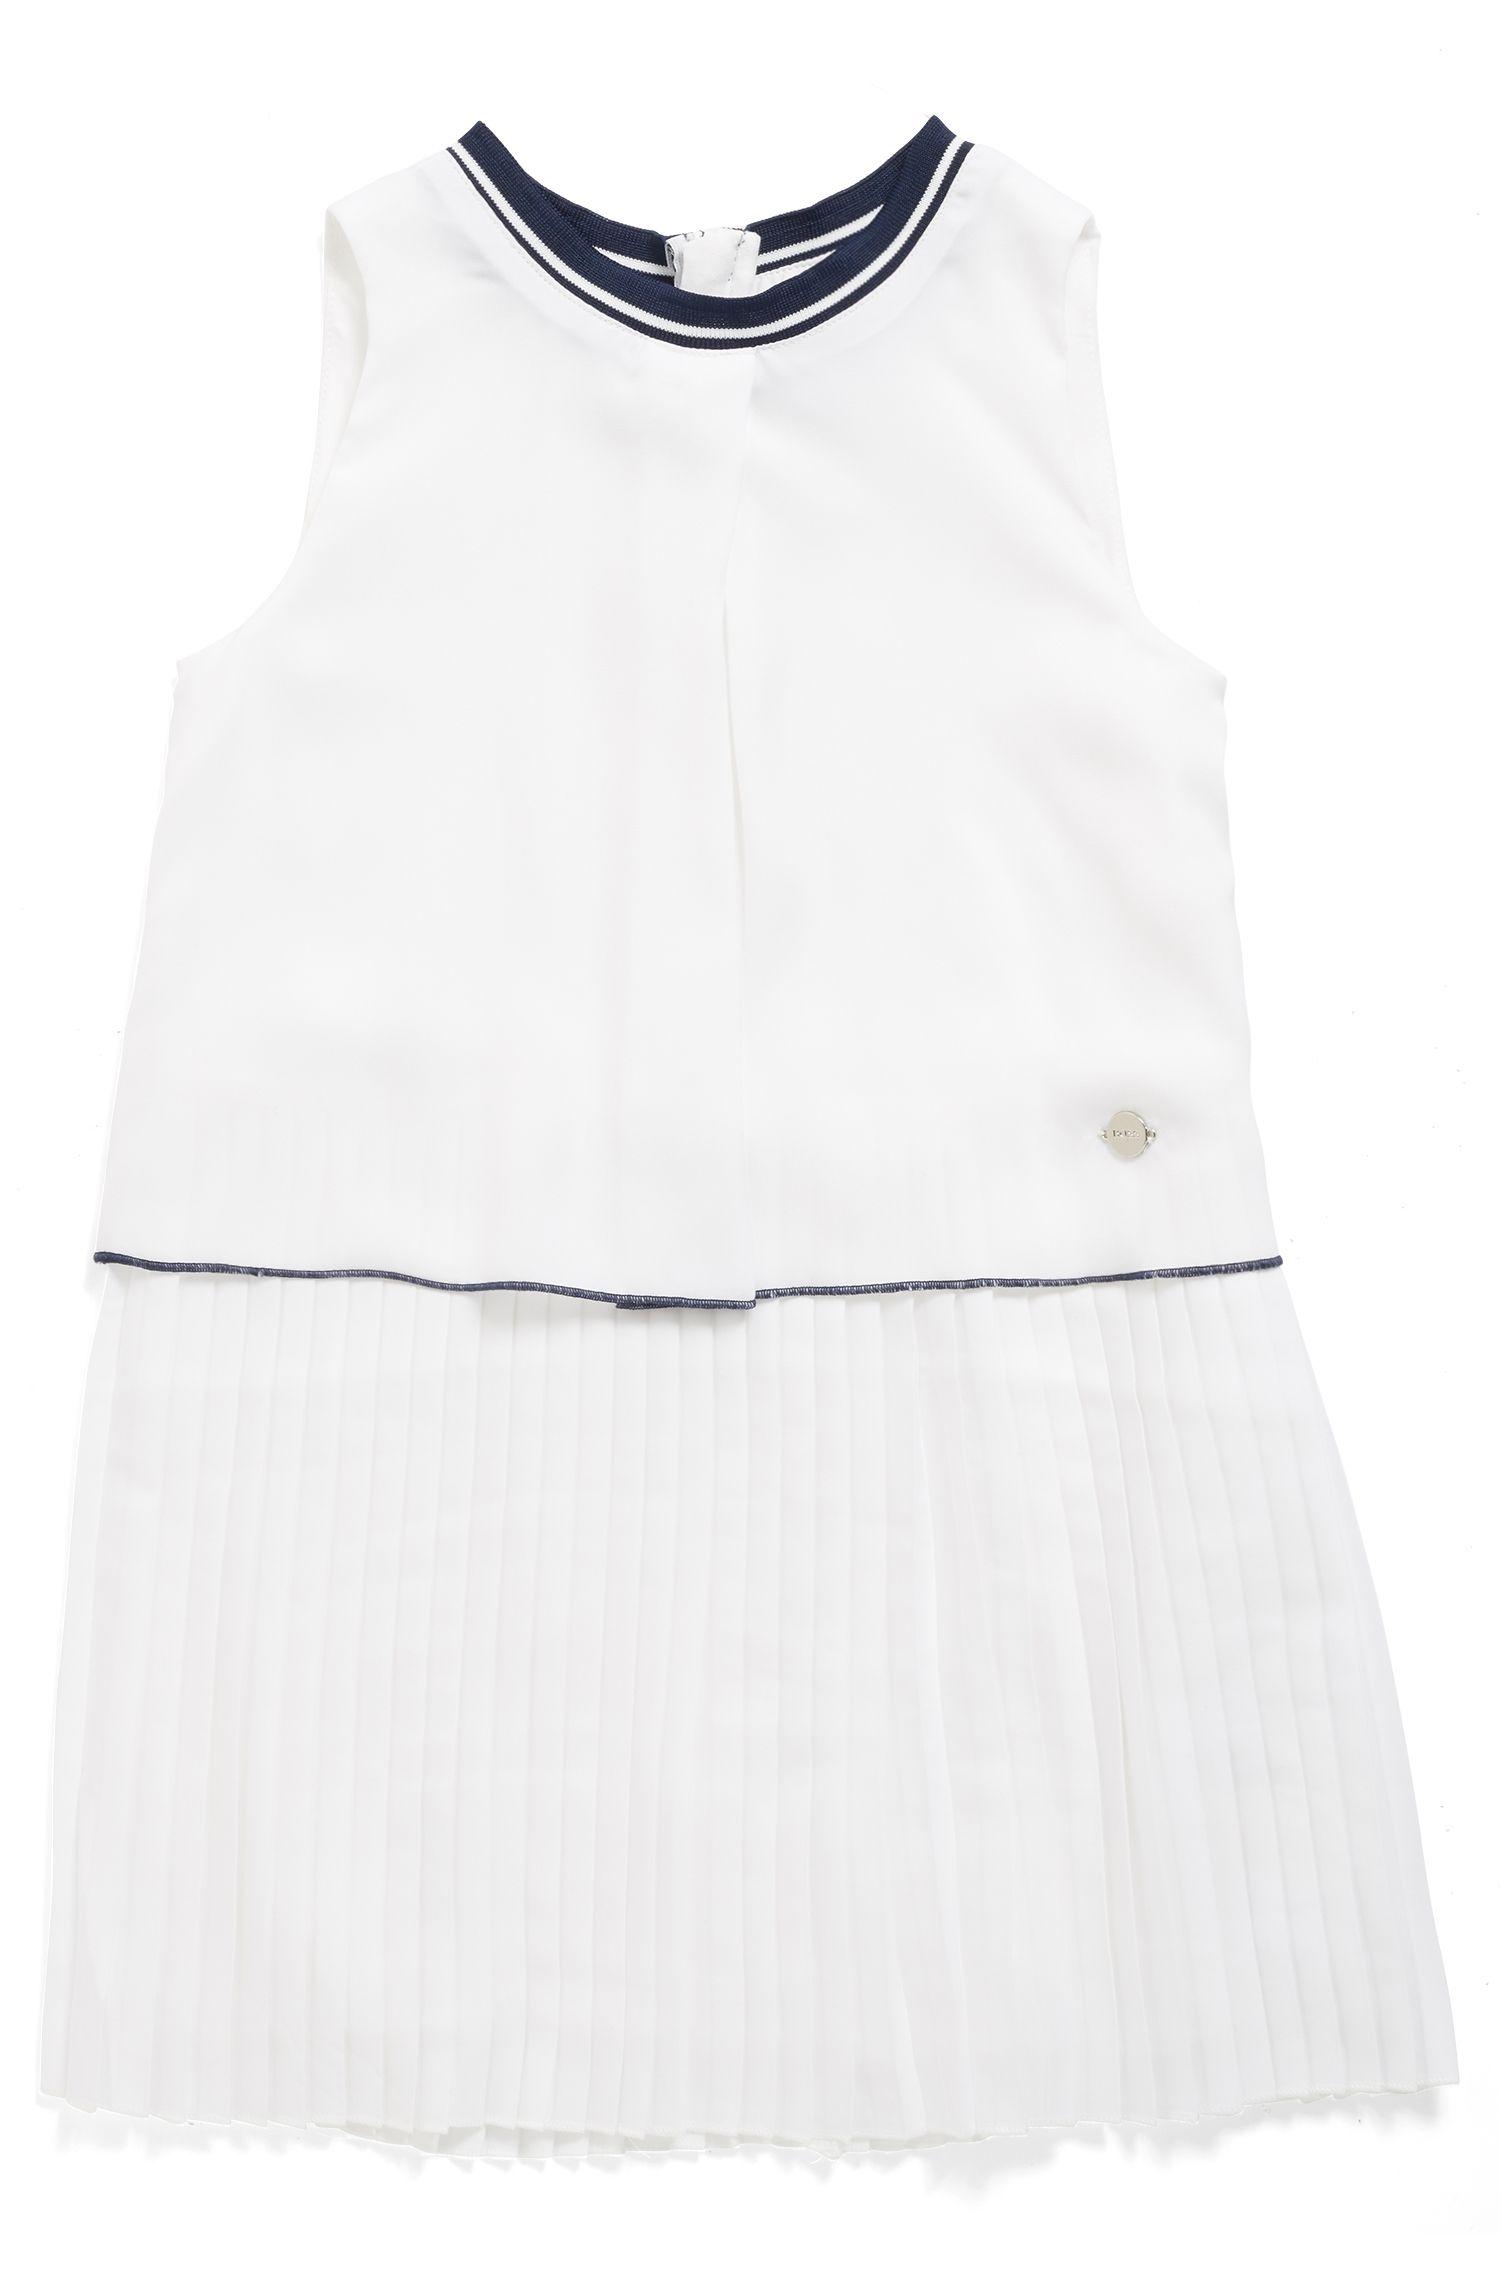 Mouwloze kinderjurk met plissérok, Wit